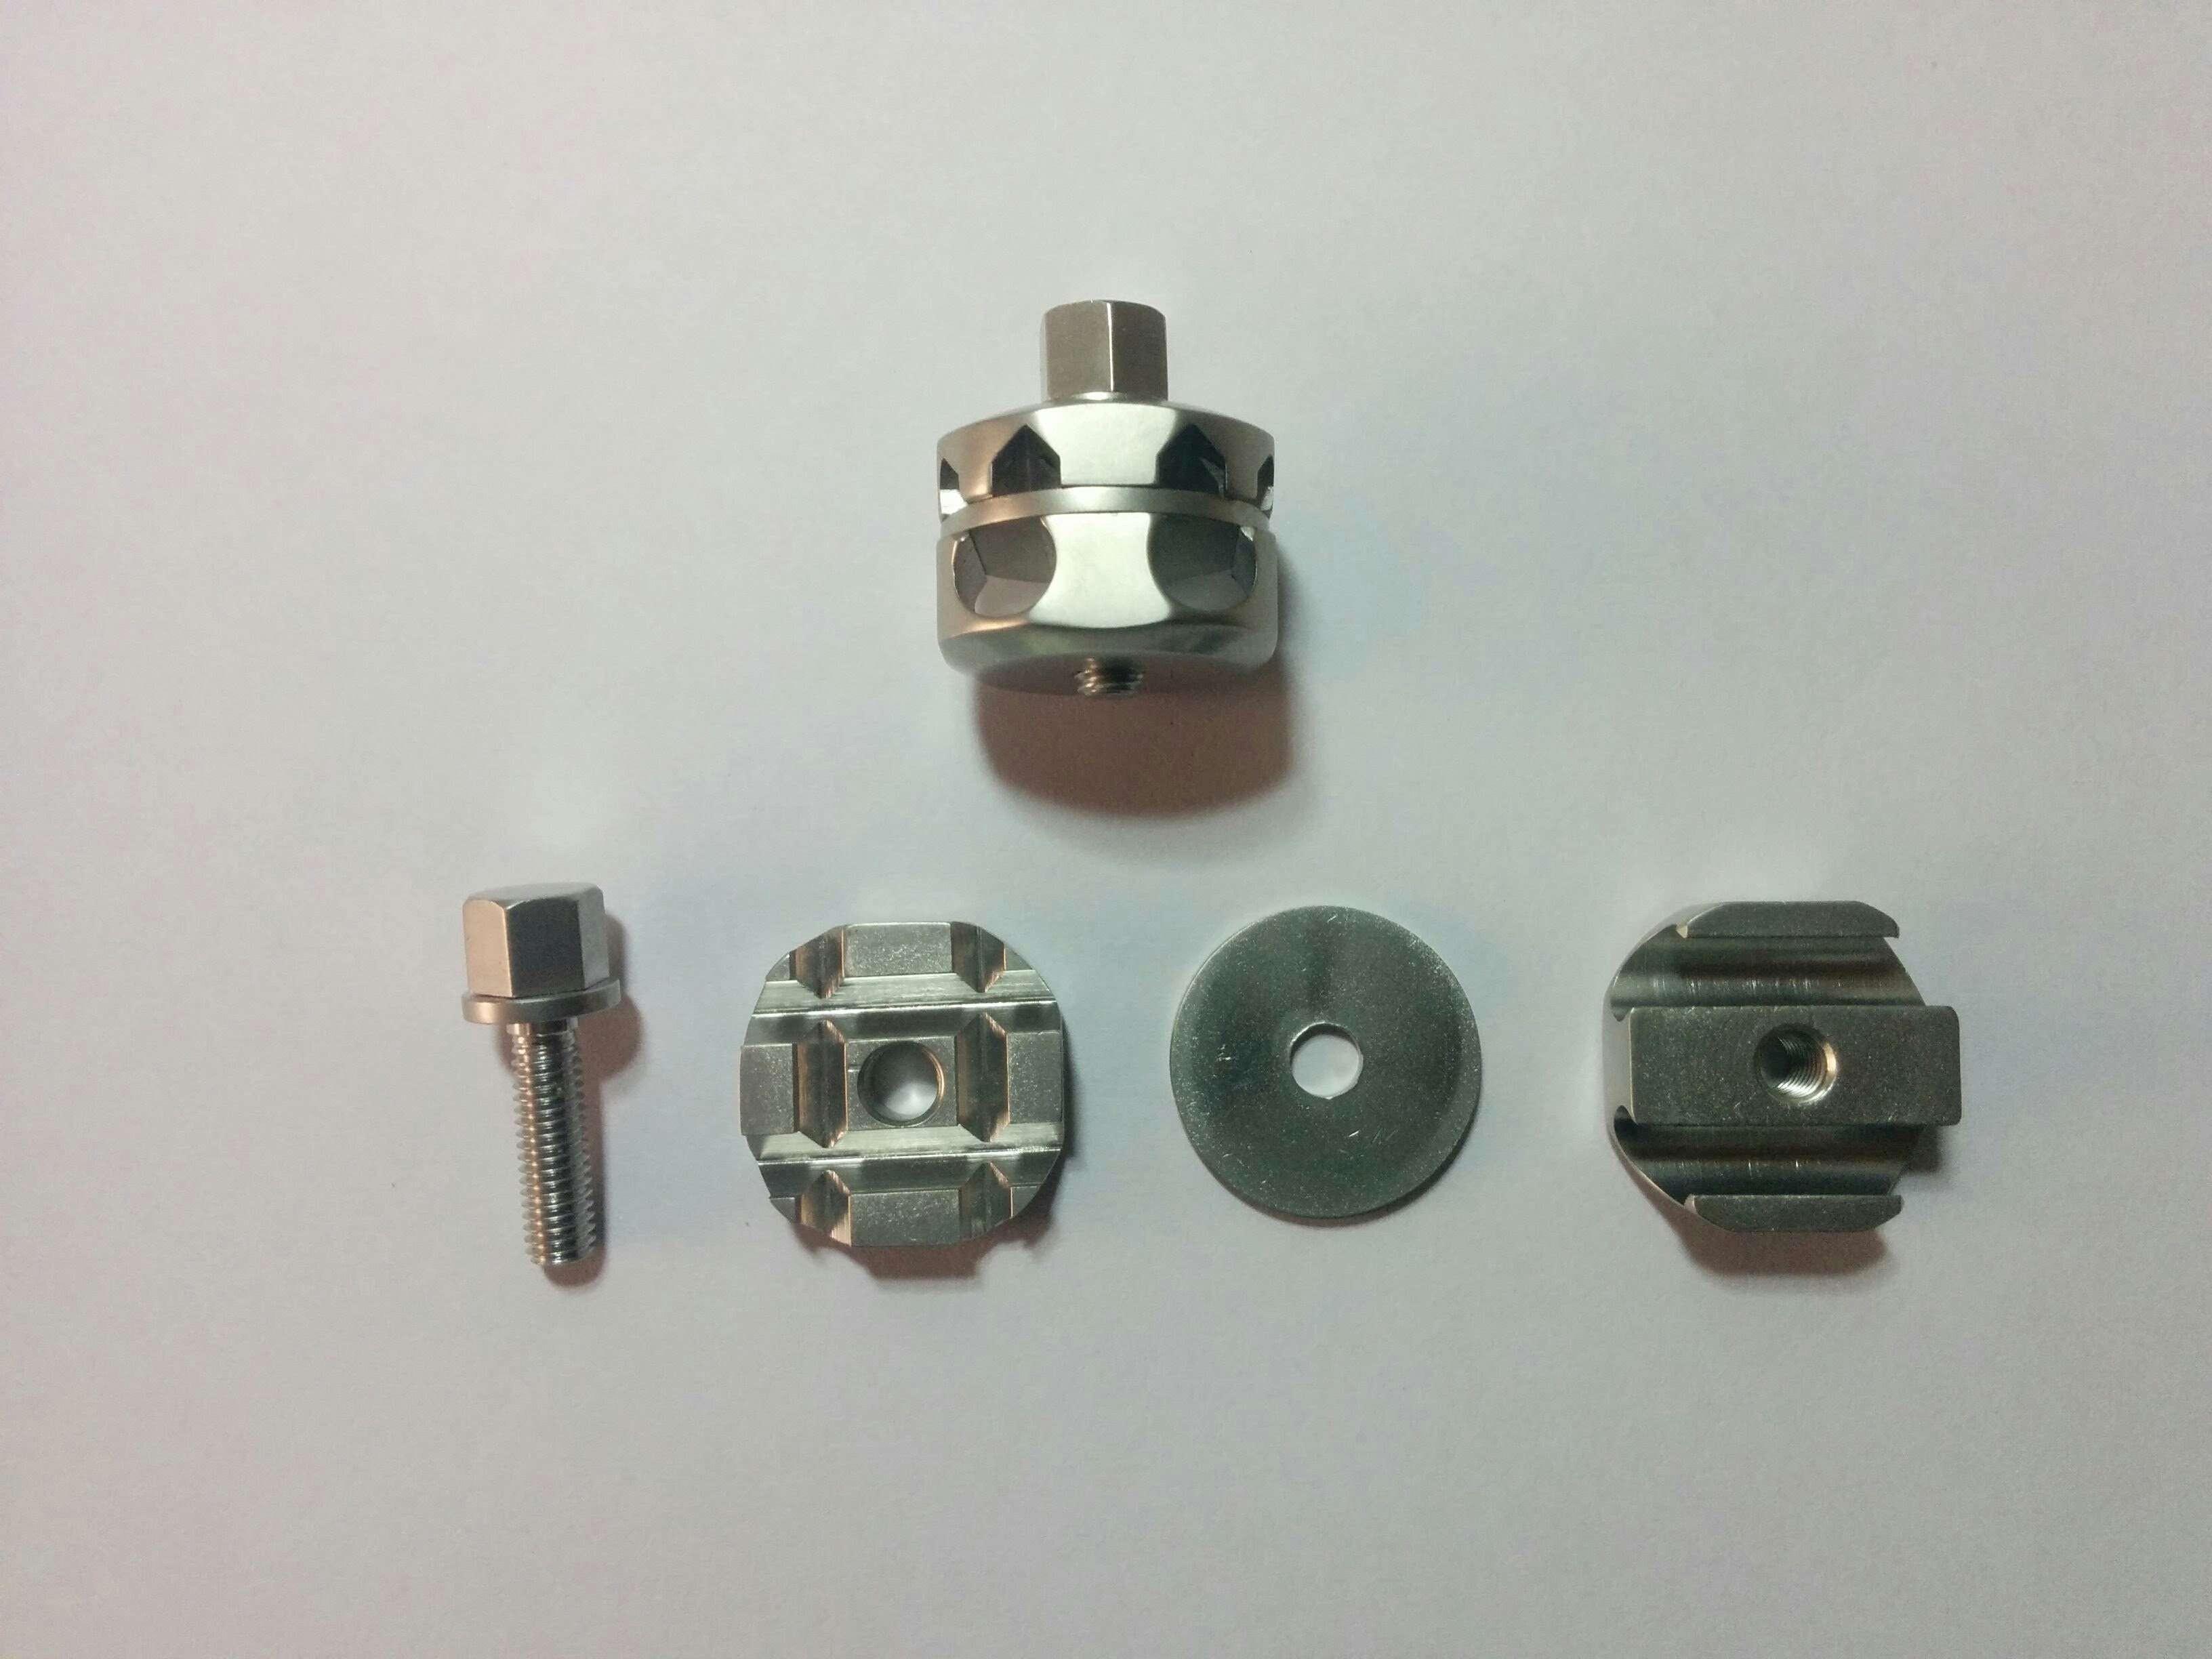 Aesculap Universal Clamp Orthopedic External Fixator